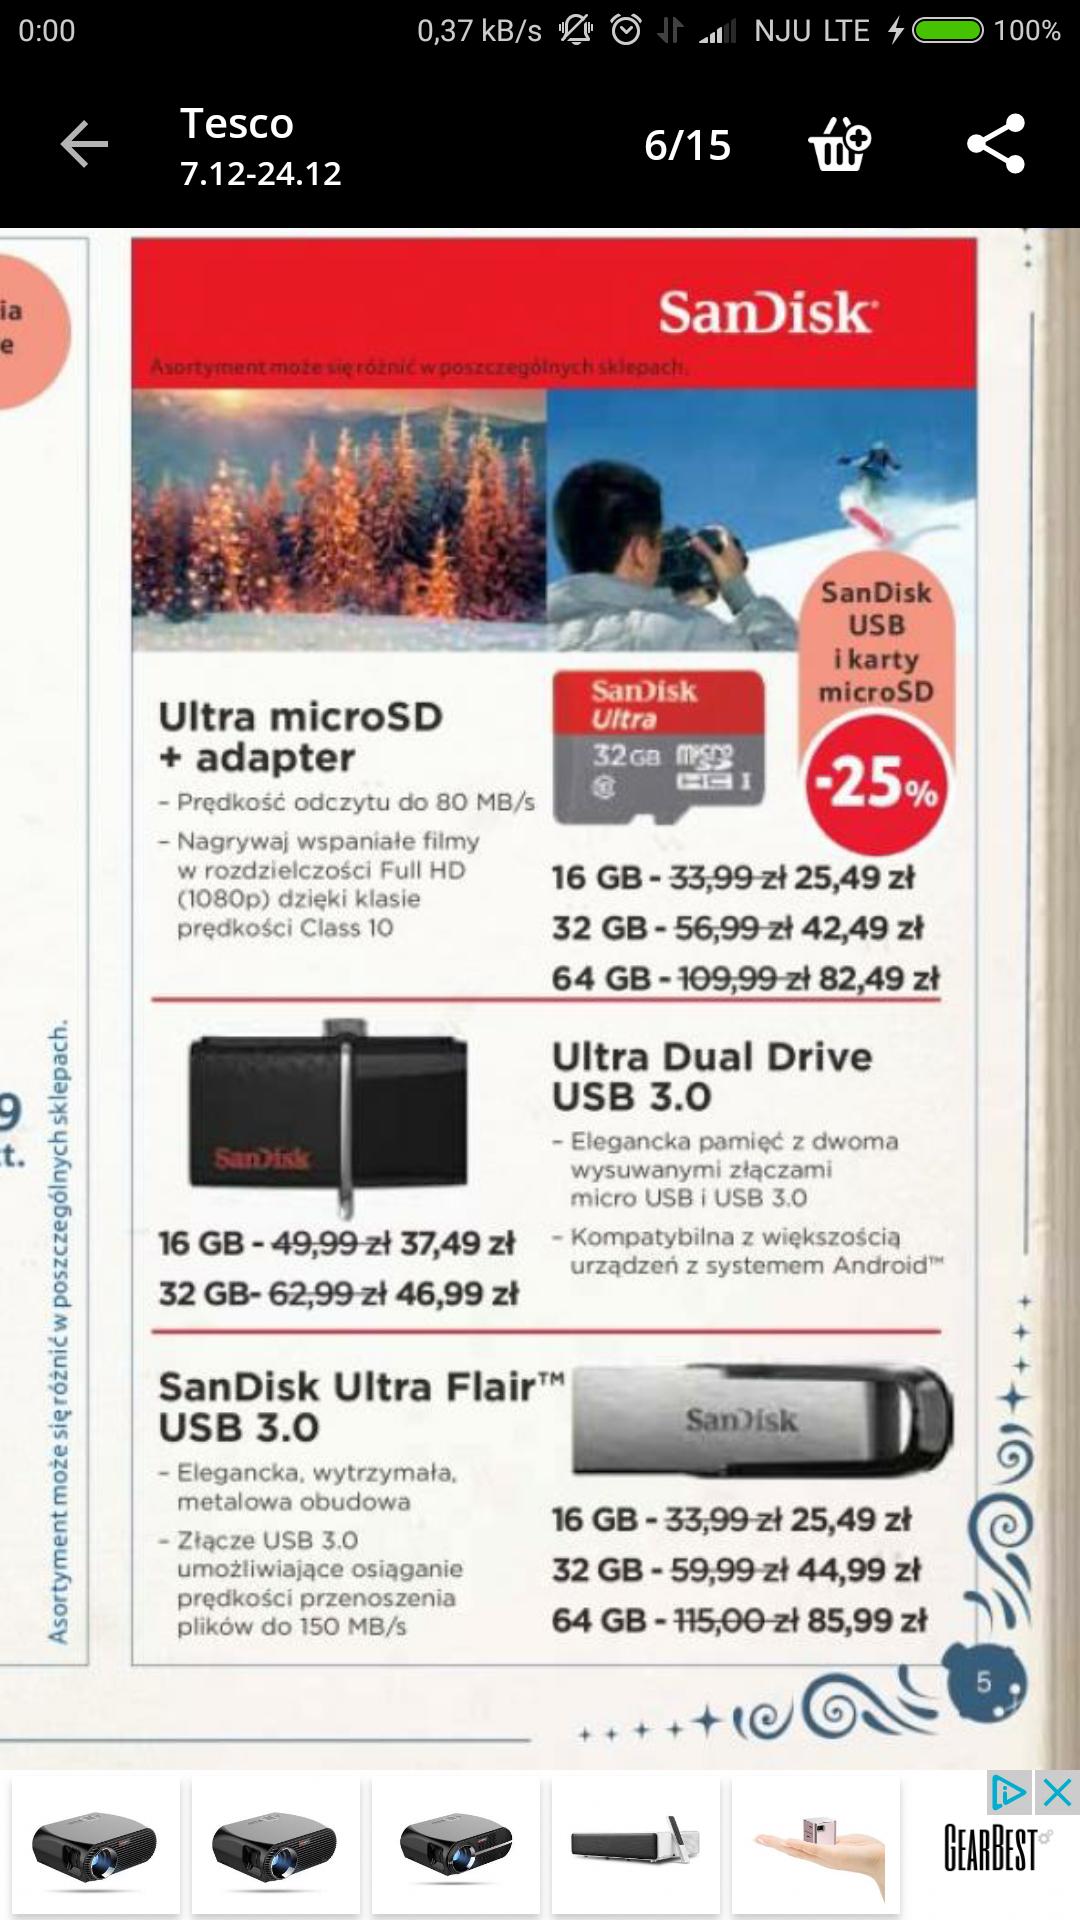 Sandisk -25% - karty microsd i usb 3.0 pendrive - Tesco